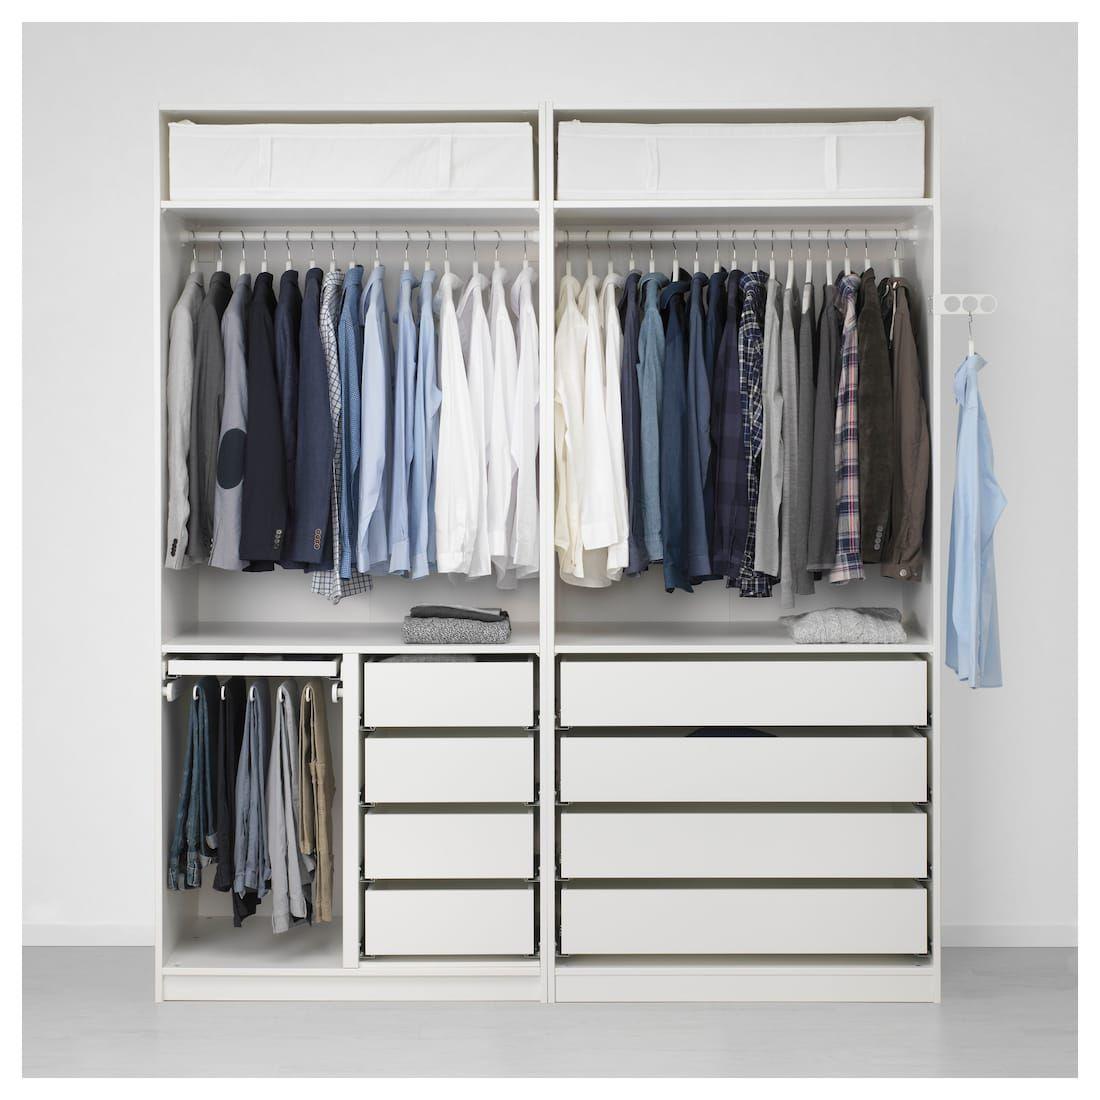 Us Furniture And Home Furnishings Ikea Wardrobe Ikea Pax